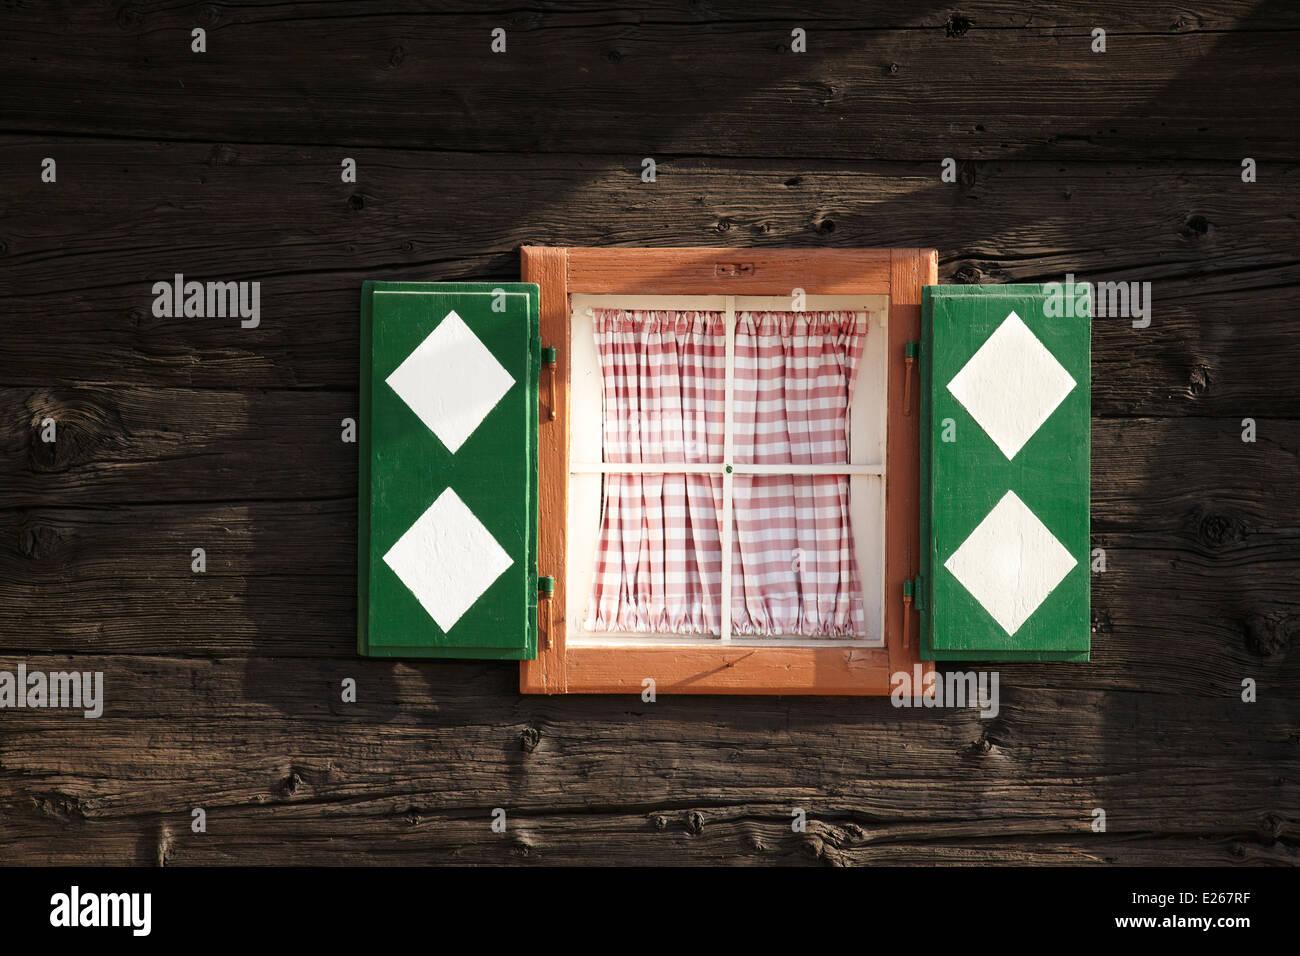 kariert stockfotos kariert bilder alamy. Black Bedroom Furniture Sets. Home Design Ideas